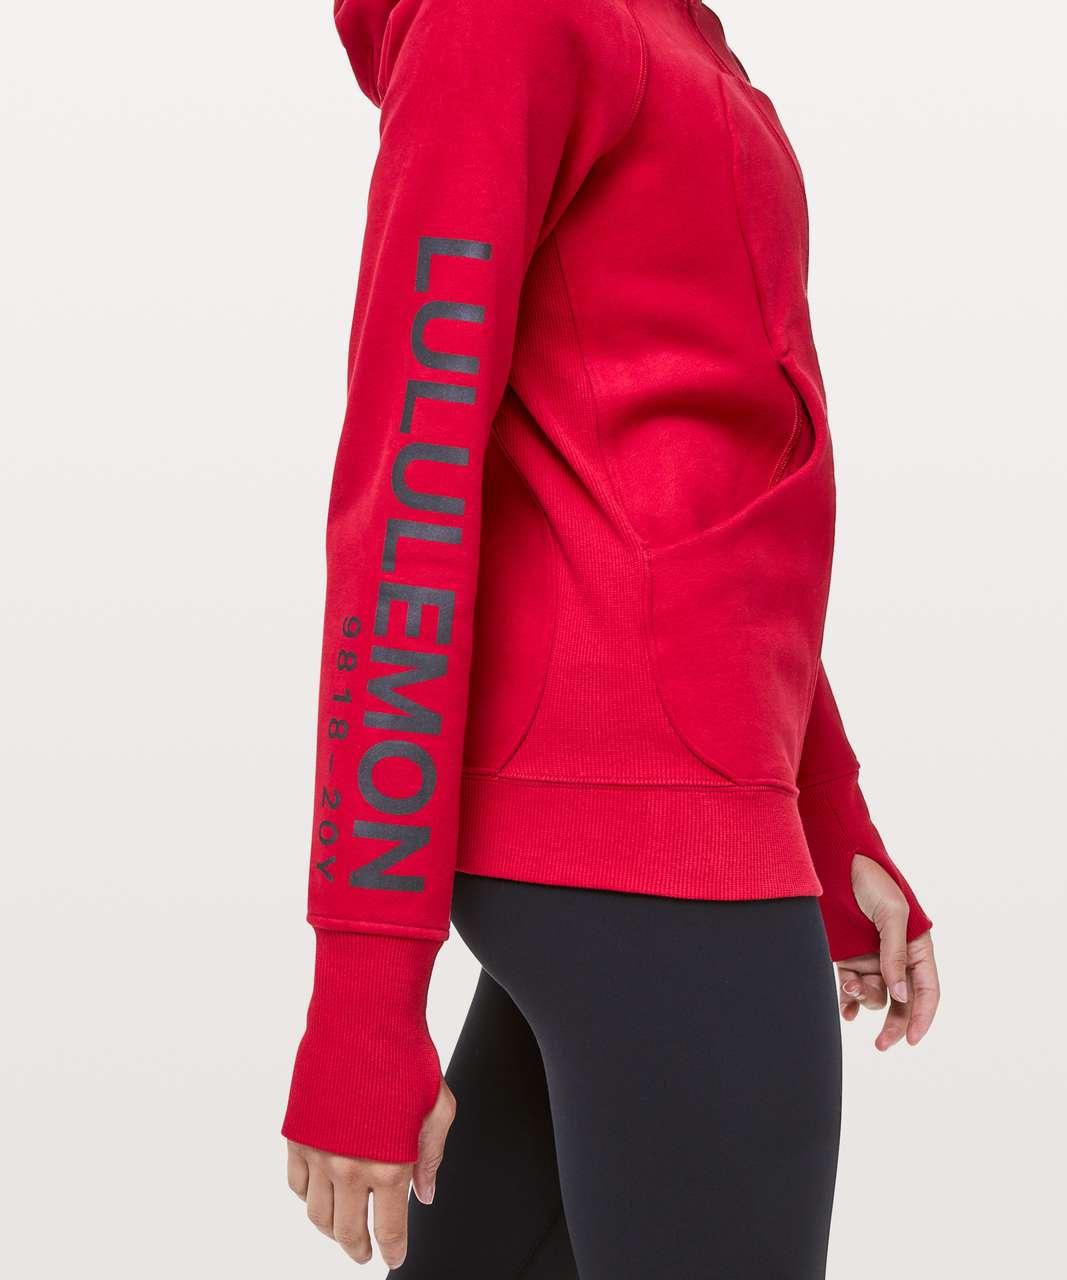 Lululemon Scuba Hoodie *20Y Collection Classic Cotton Fleece - Dark Red